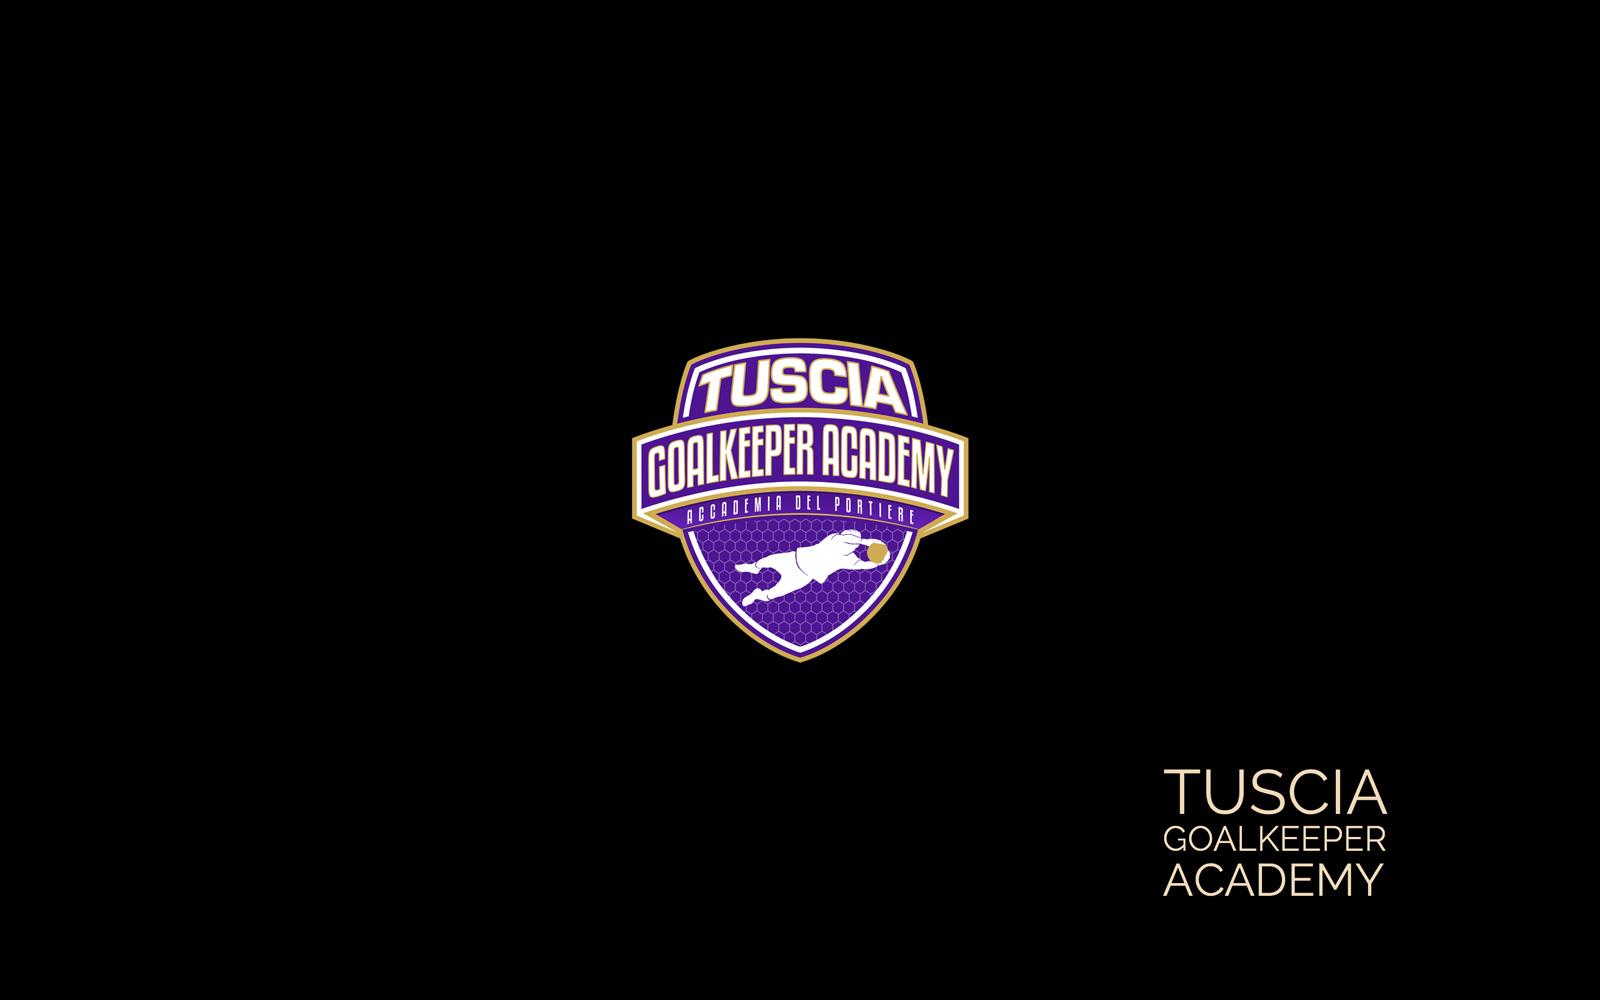 tuscia-goalkeeper-academy